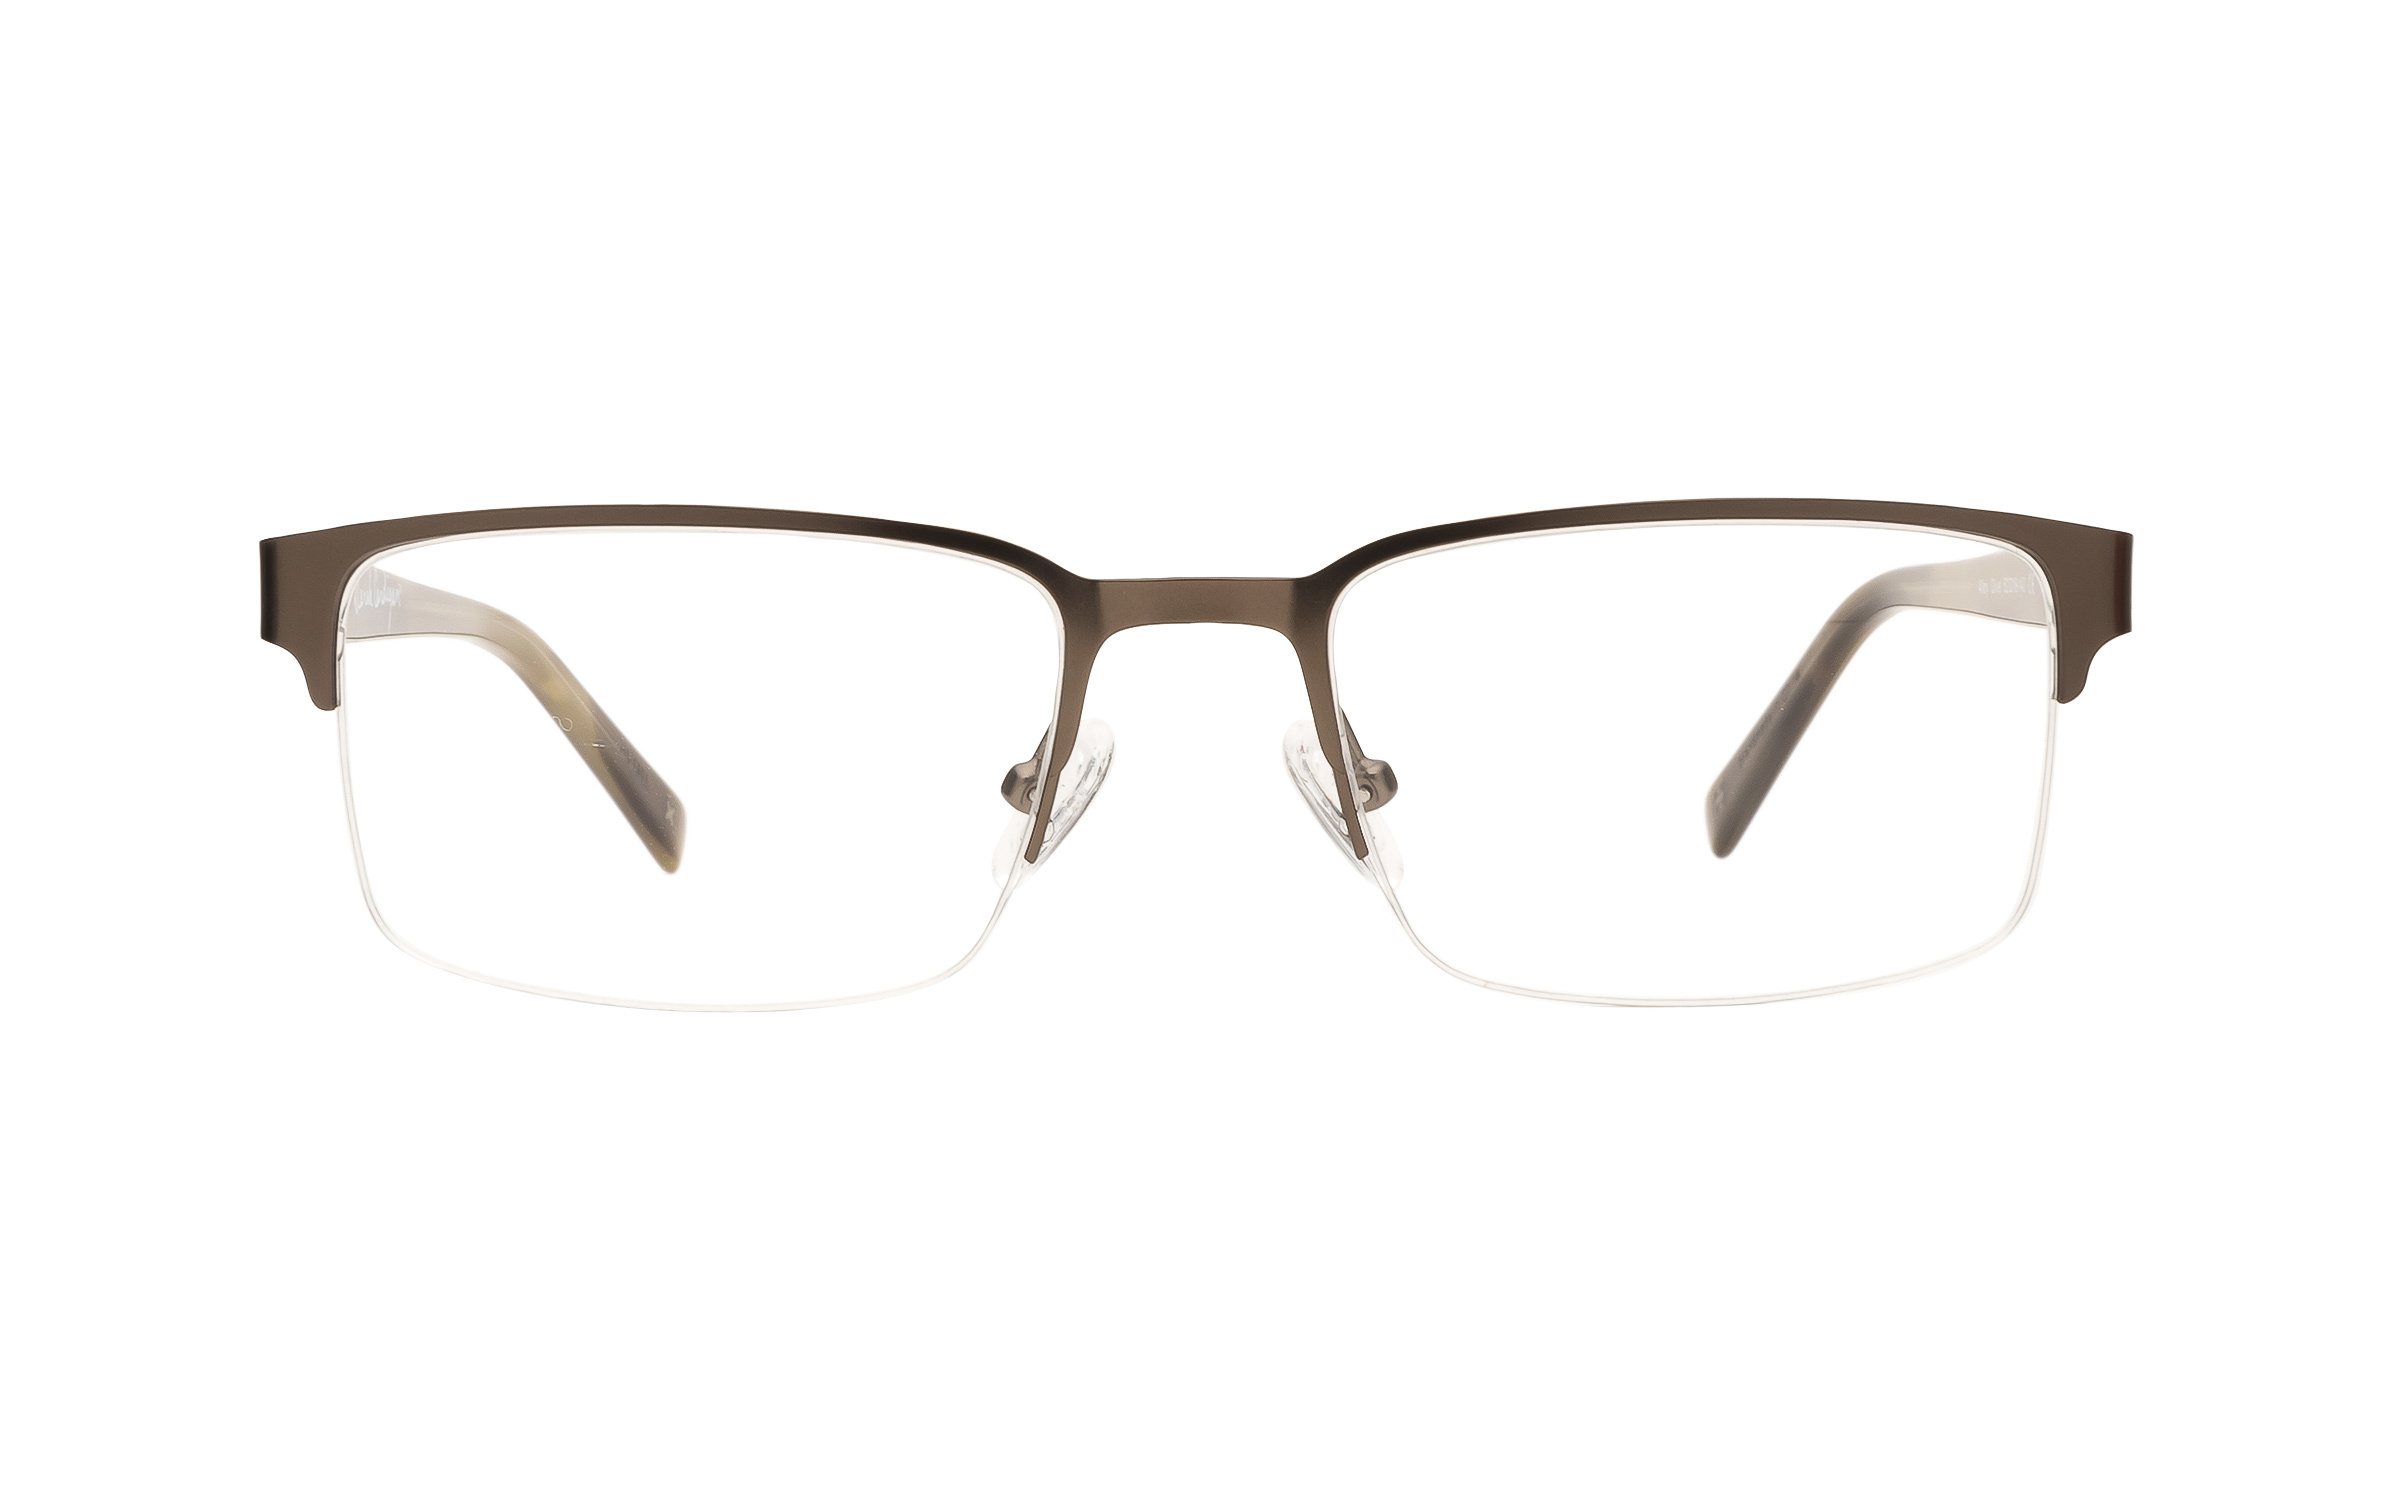 Derek_Cardigan_Mens_Glasses_Semi_Rimless_GreyGreen_Online_Coastal